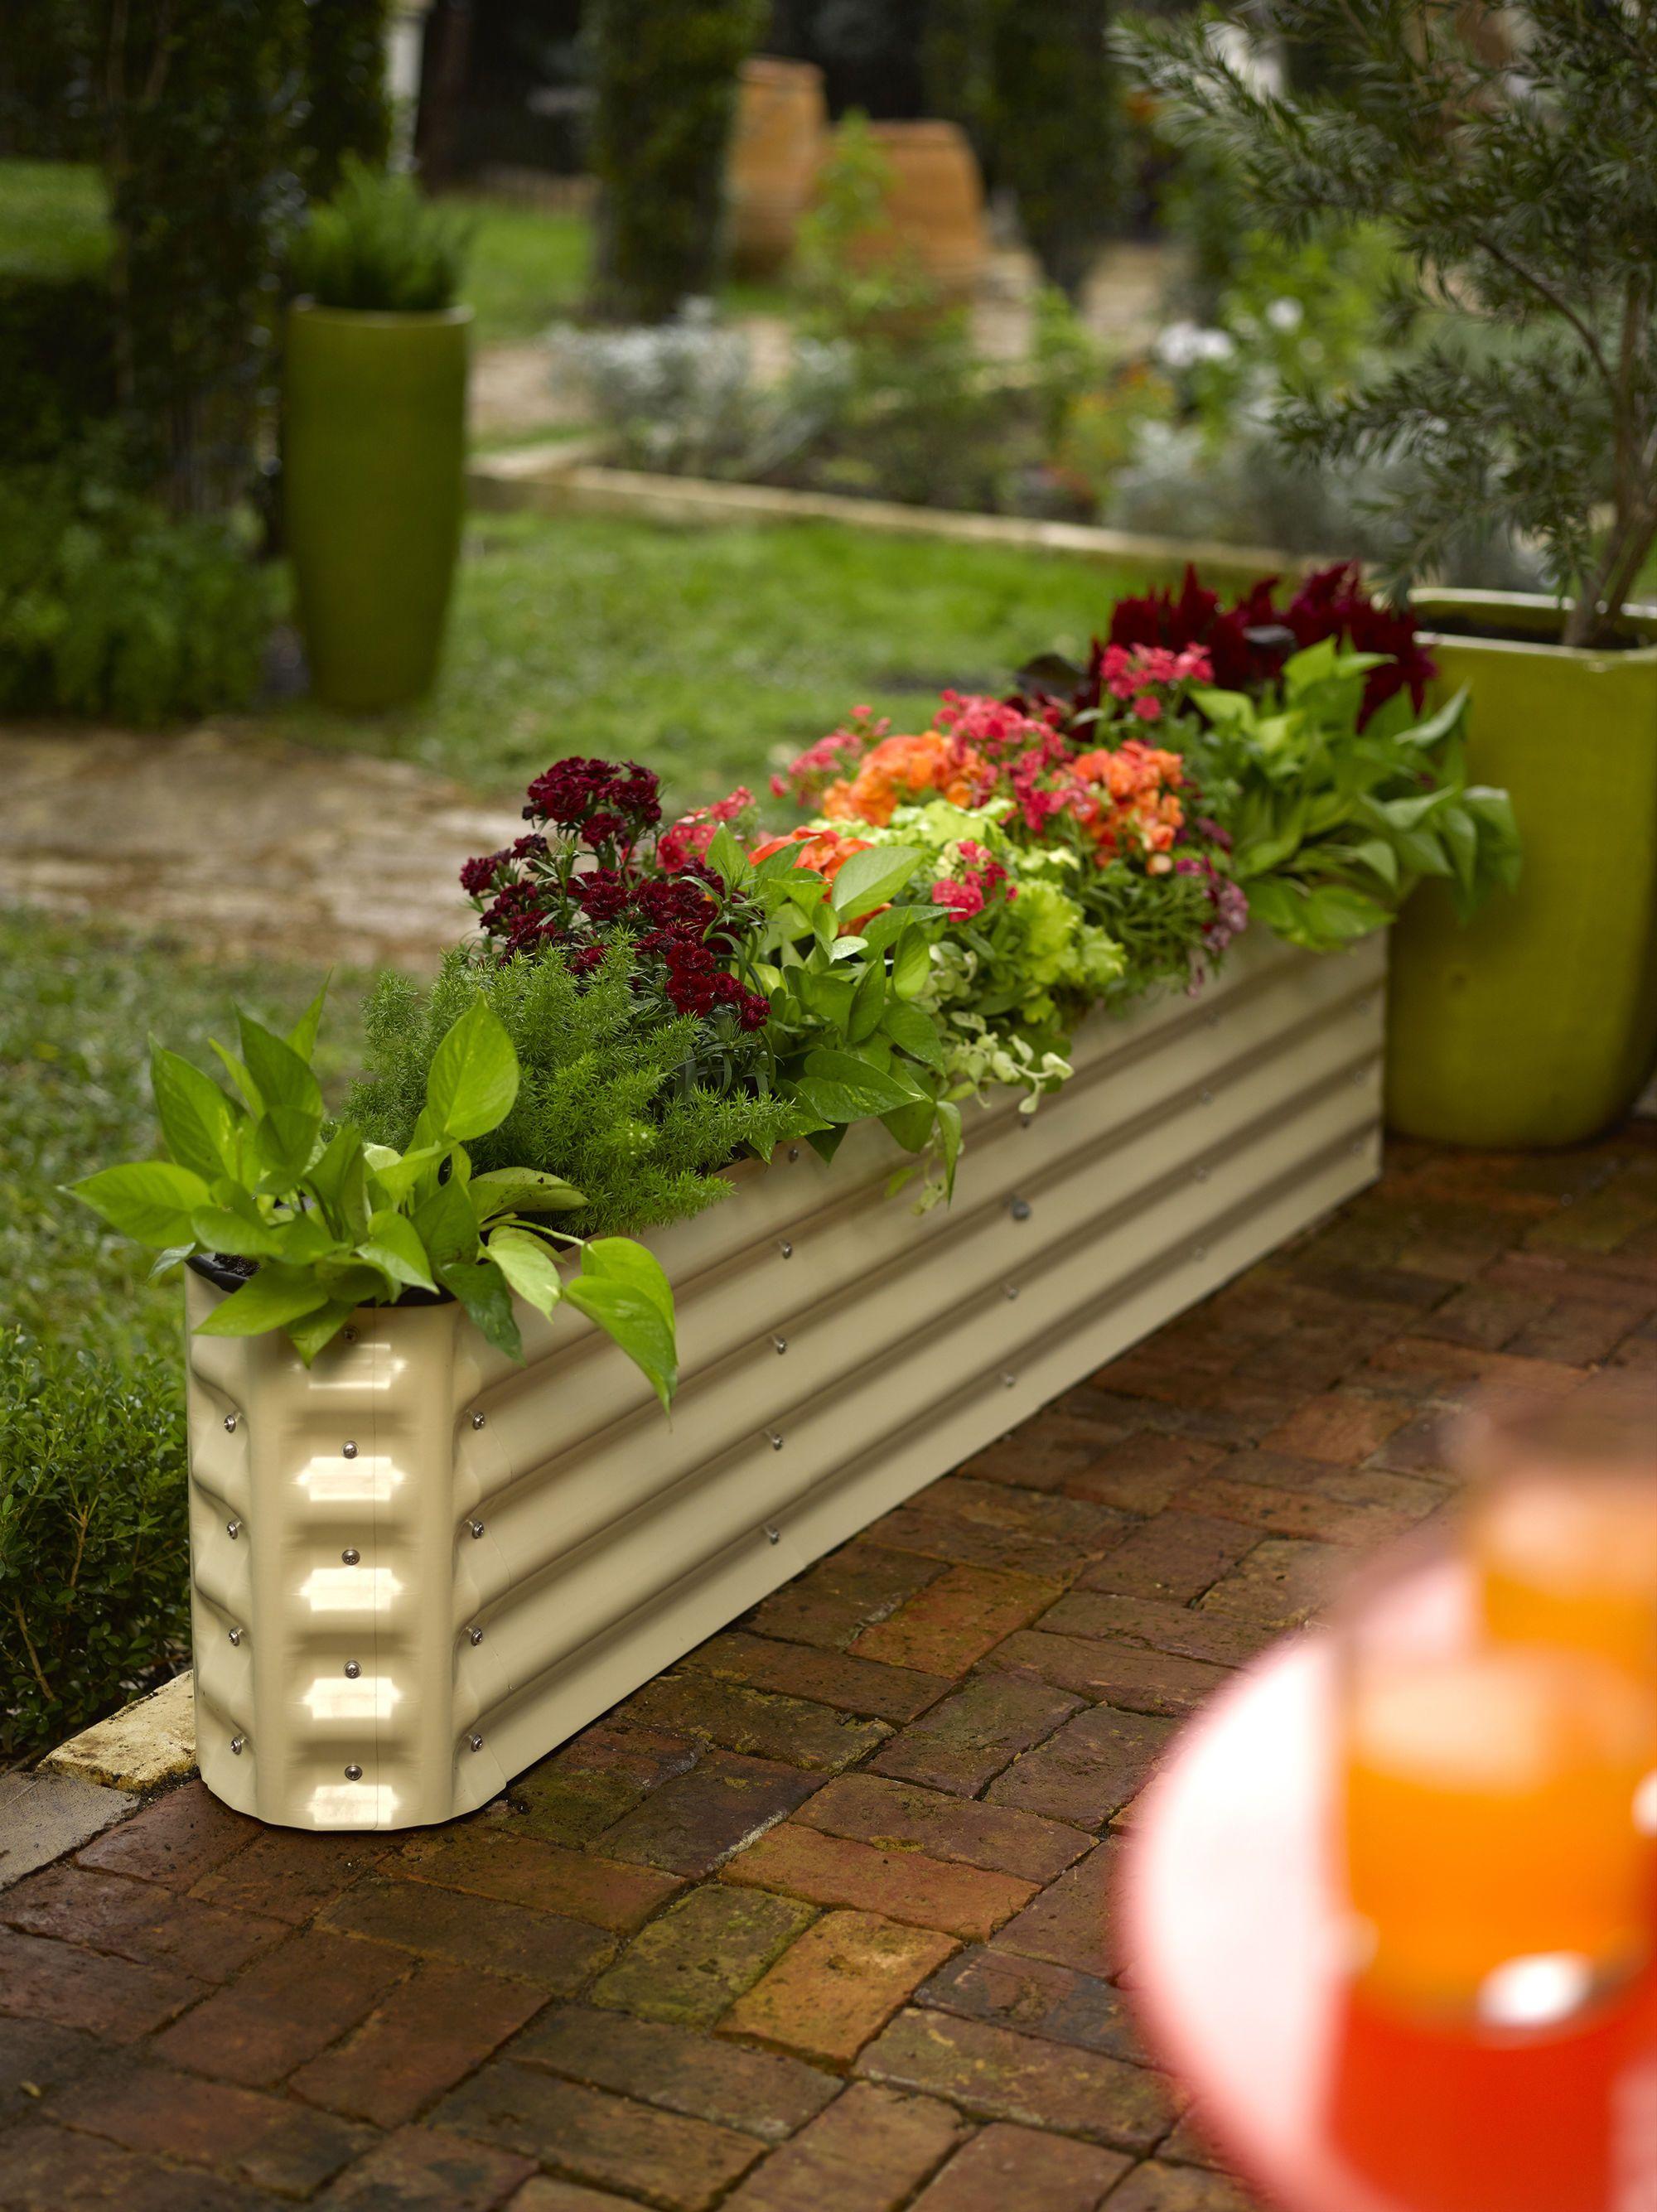 cedar bed kit store garden raised